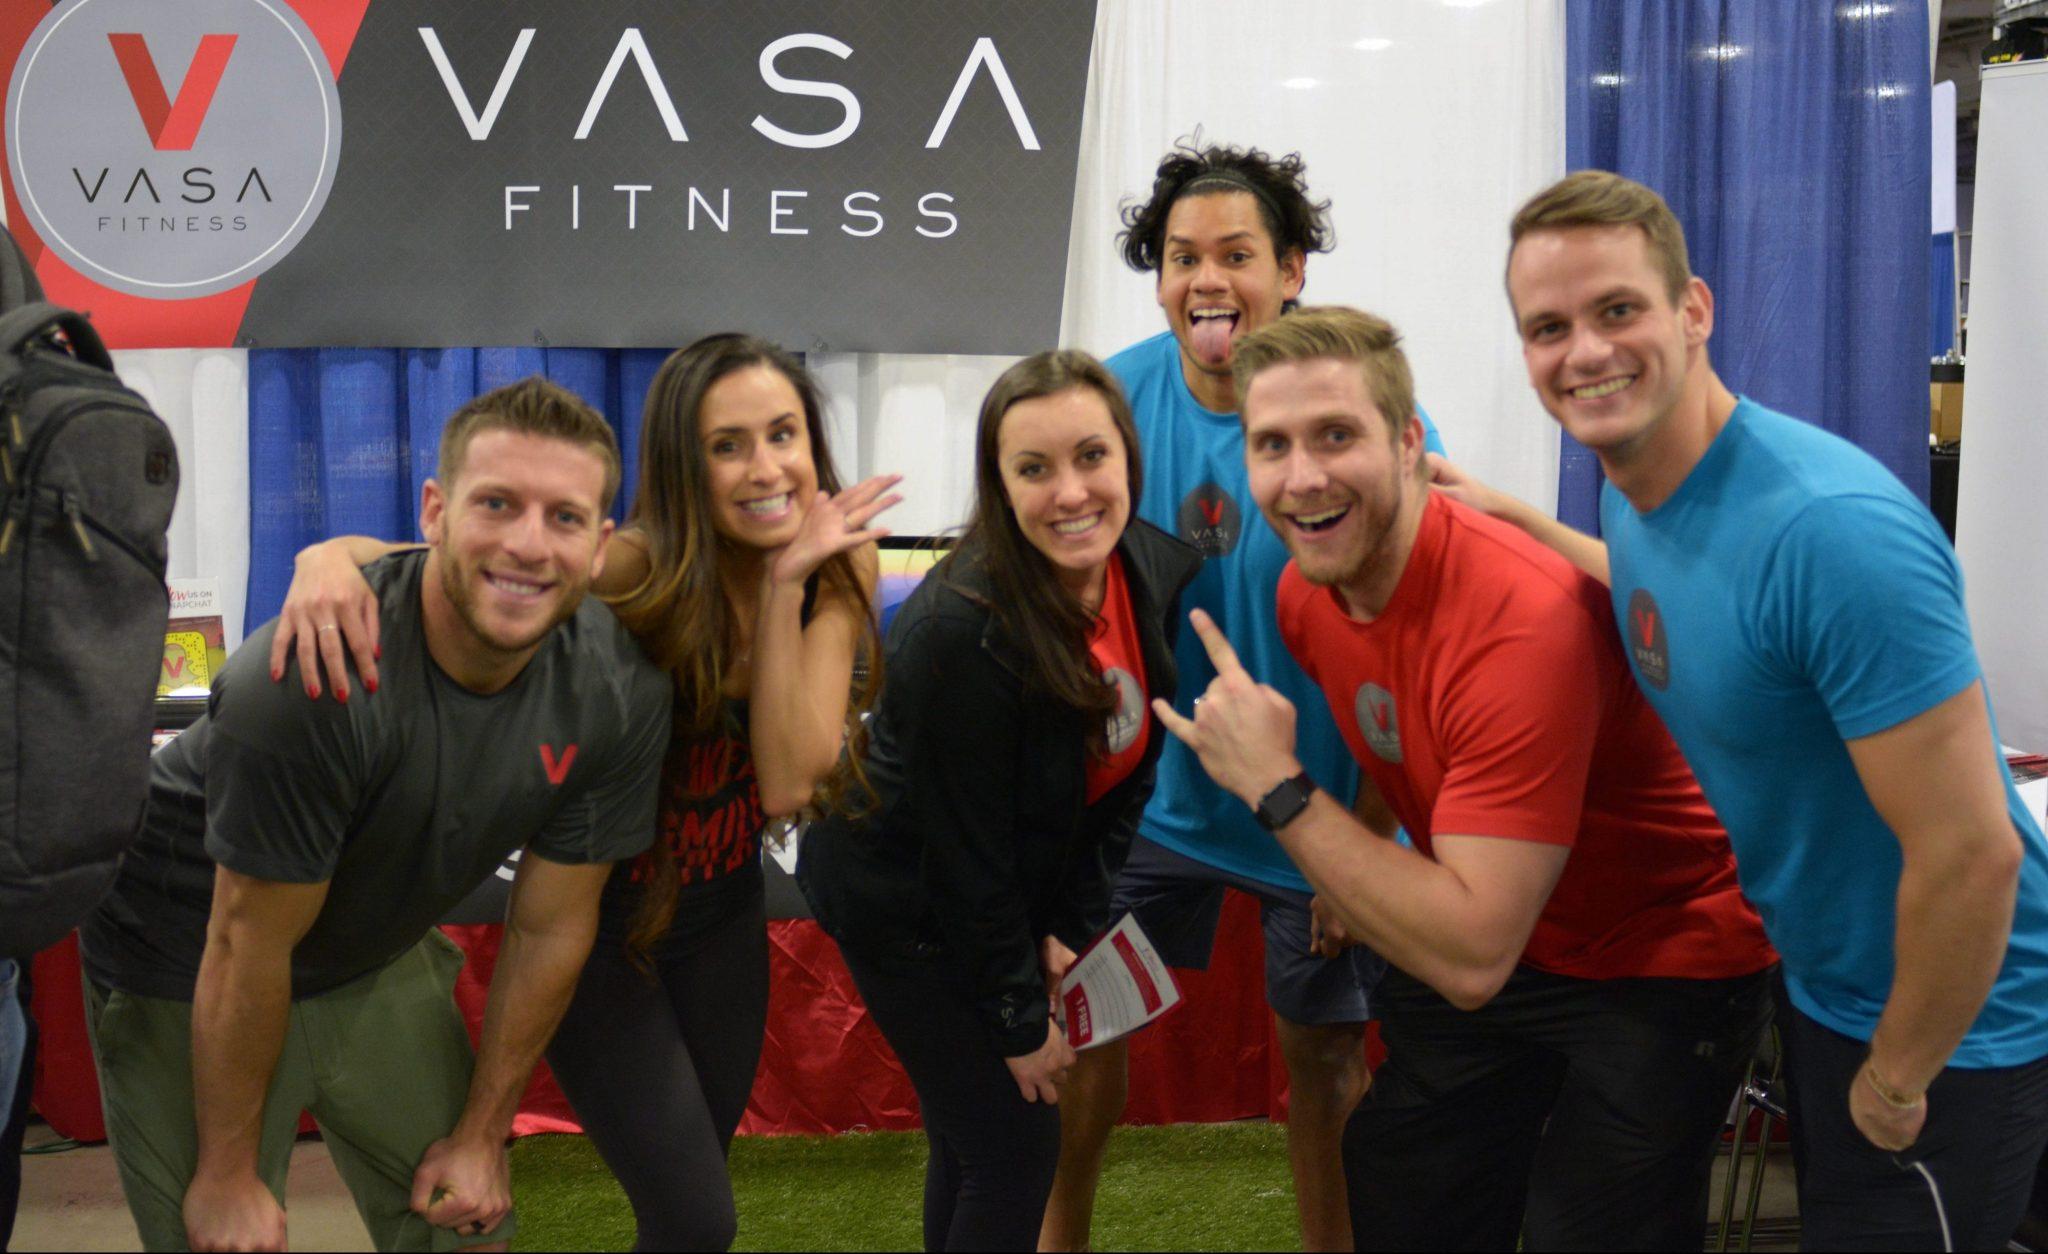 VASA EVENT | FITCON UTAH 2017 - VASA Fitness